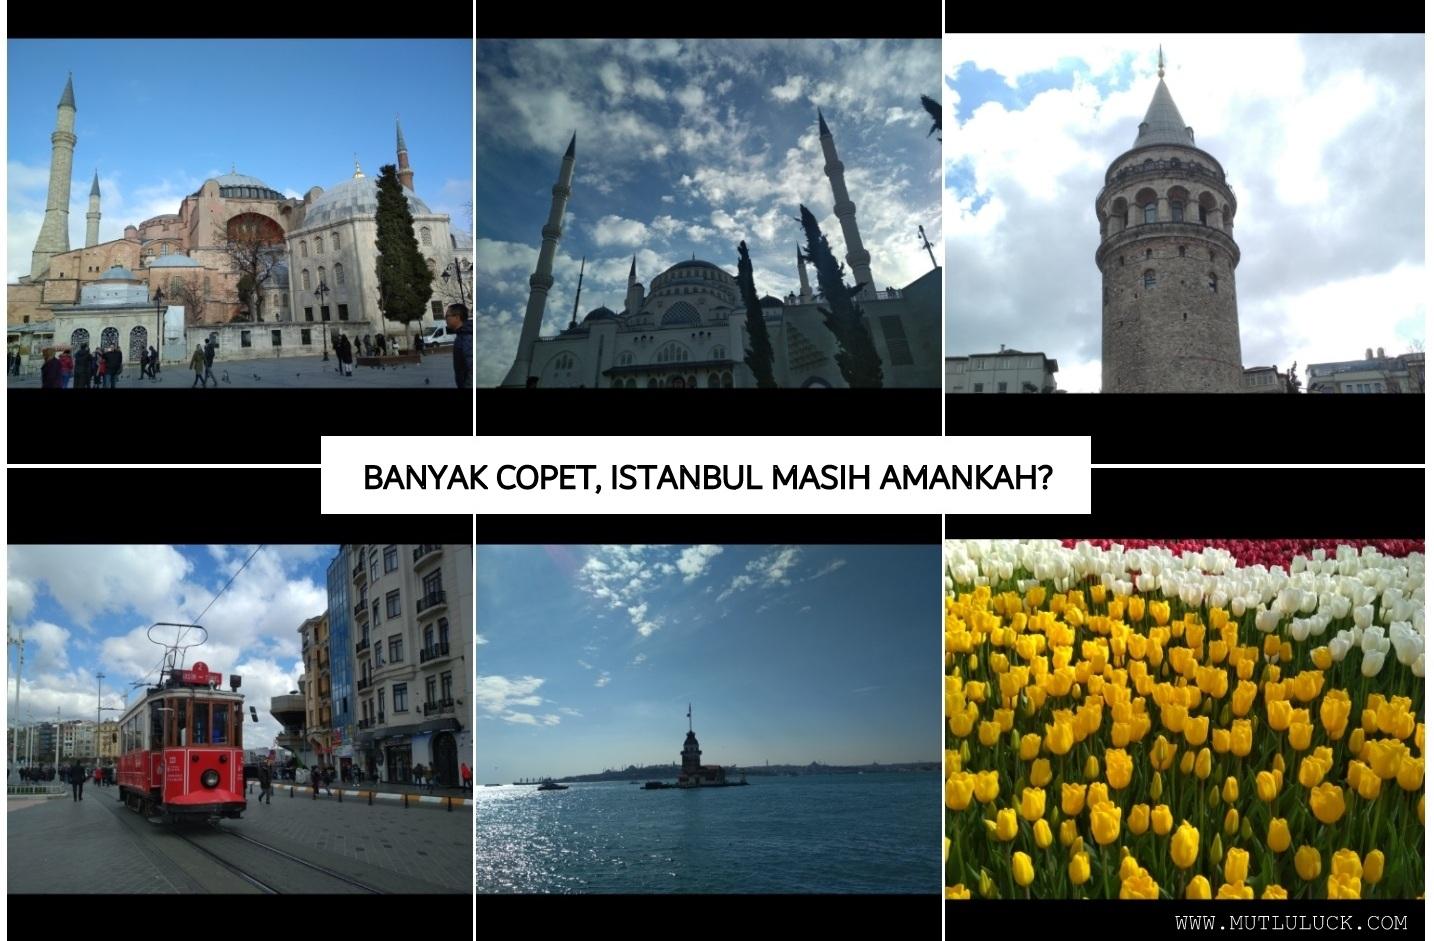 JALAN-JALAN KE ISTANBUL TURKI, APAKAH AMAN?